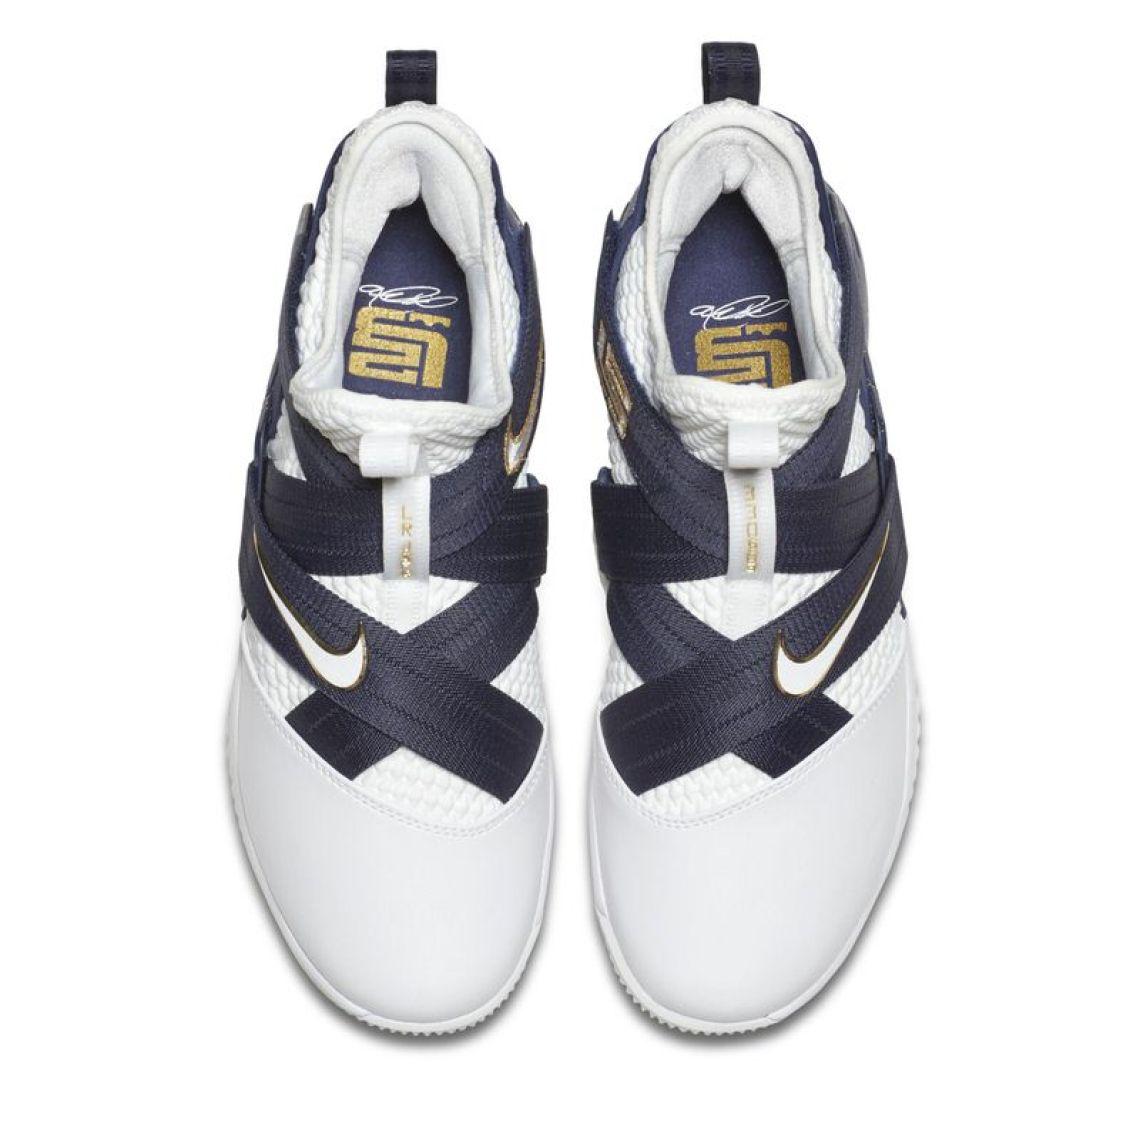 c2e963067858 Nike LeBron Soldier 12